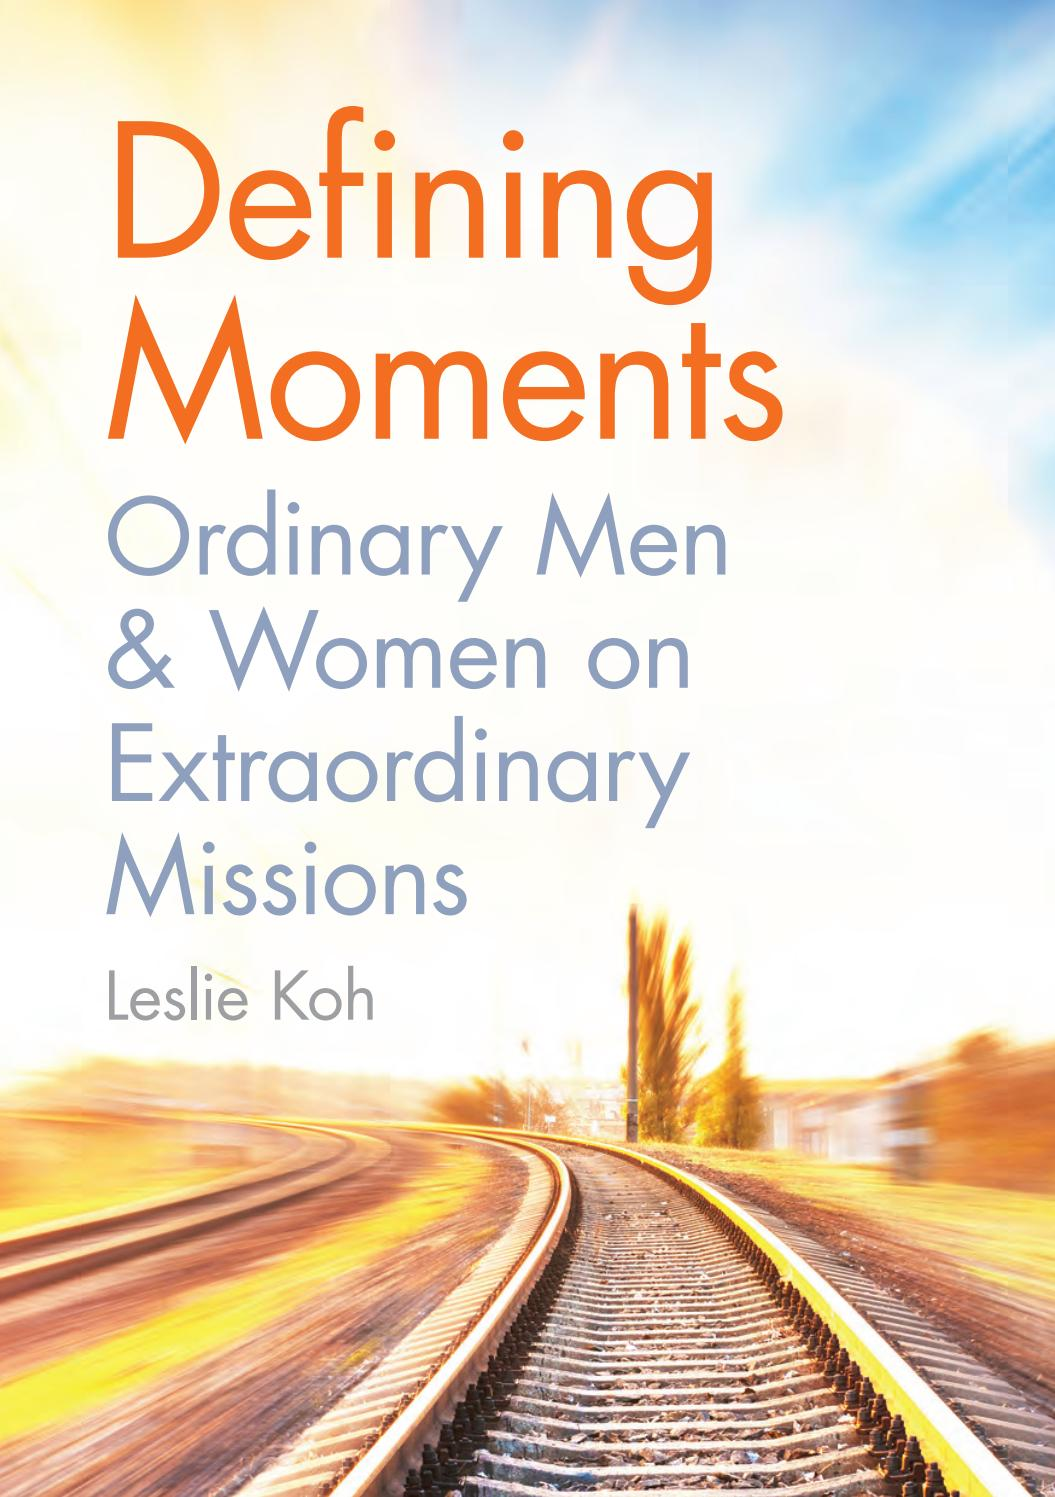 Defining Moment: Ordinary Men & Women on Extraordinary